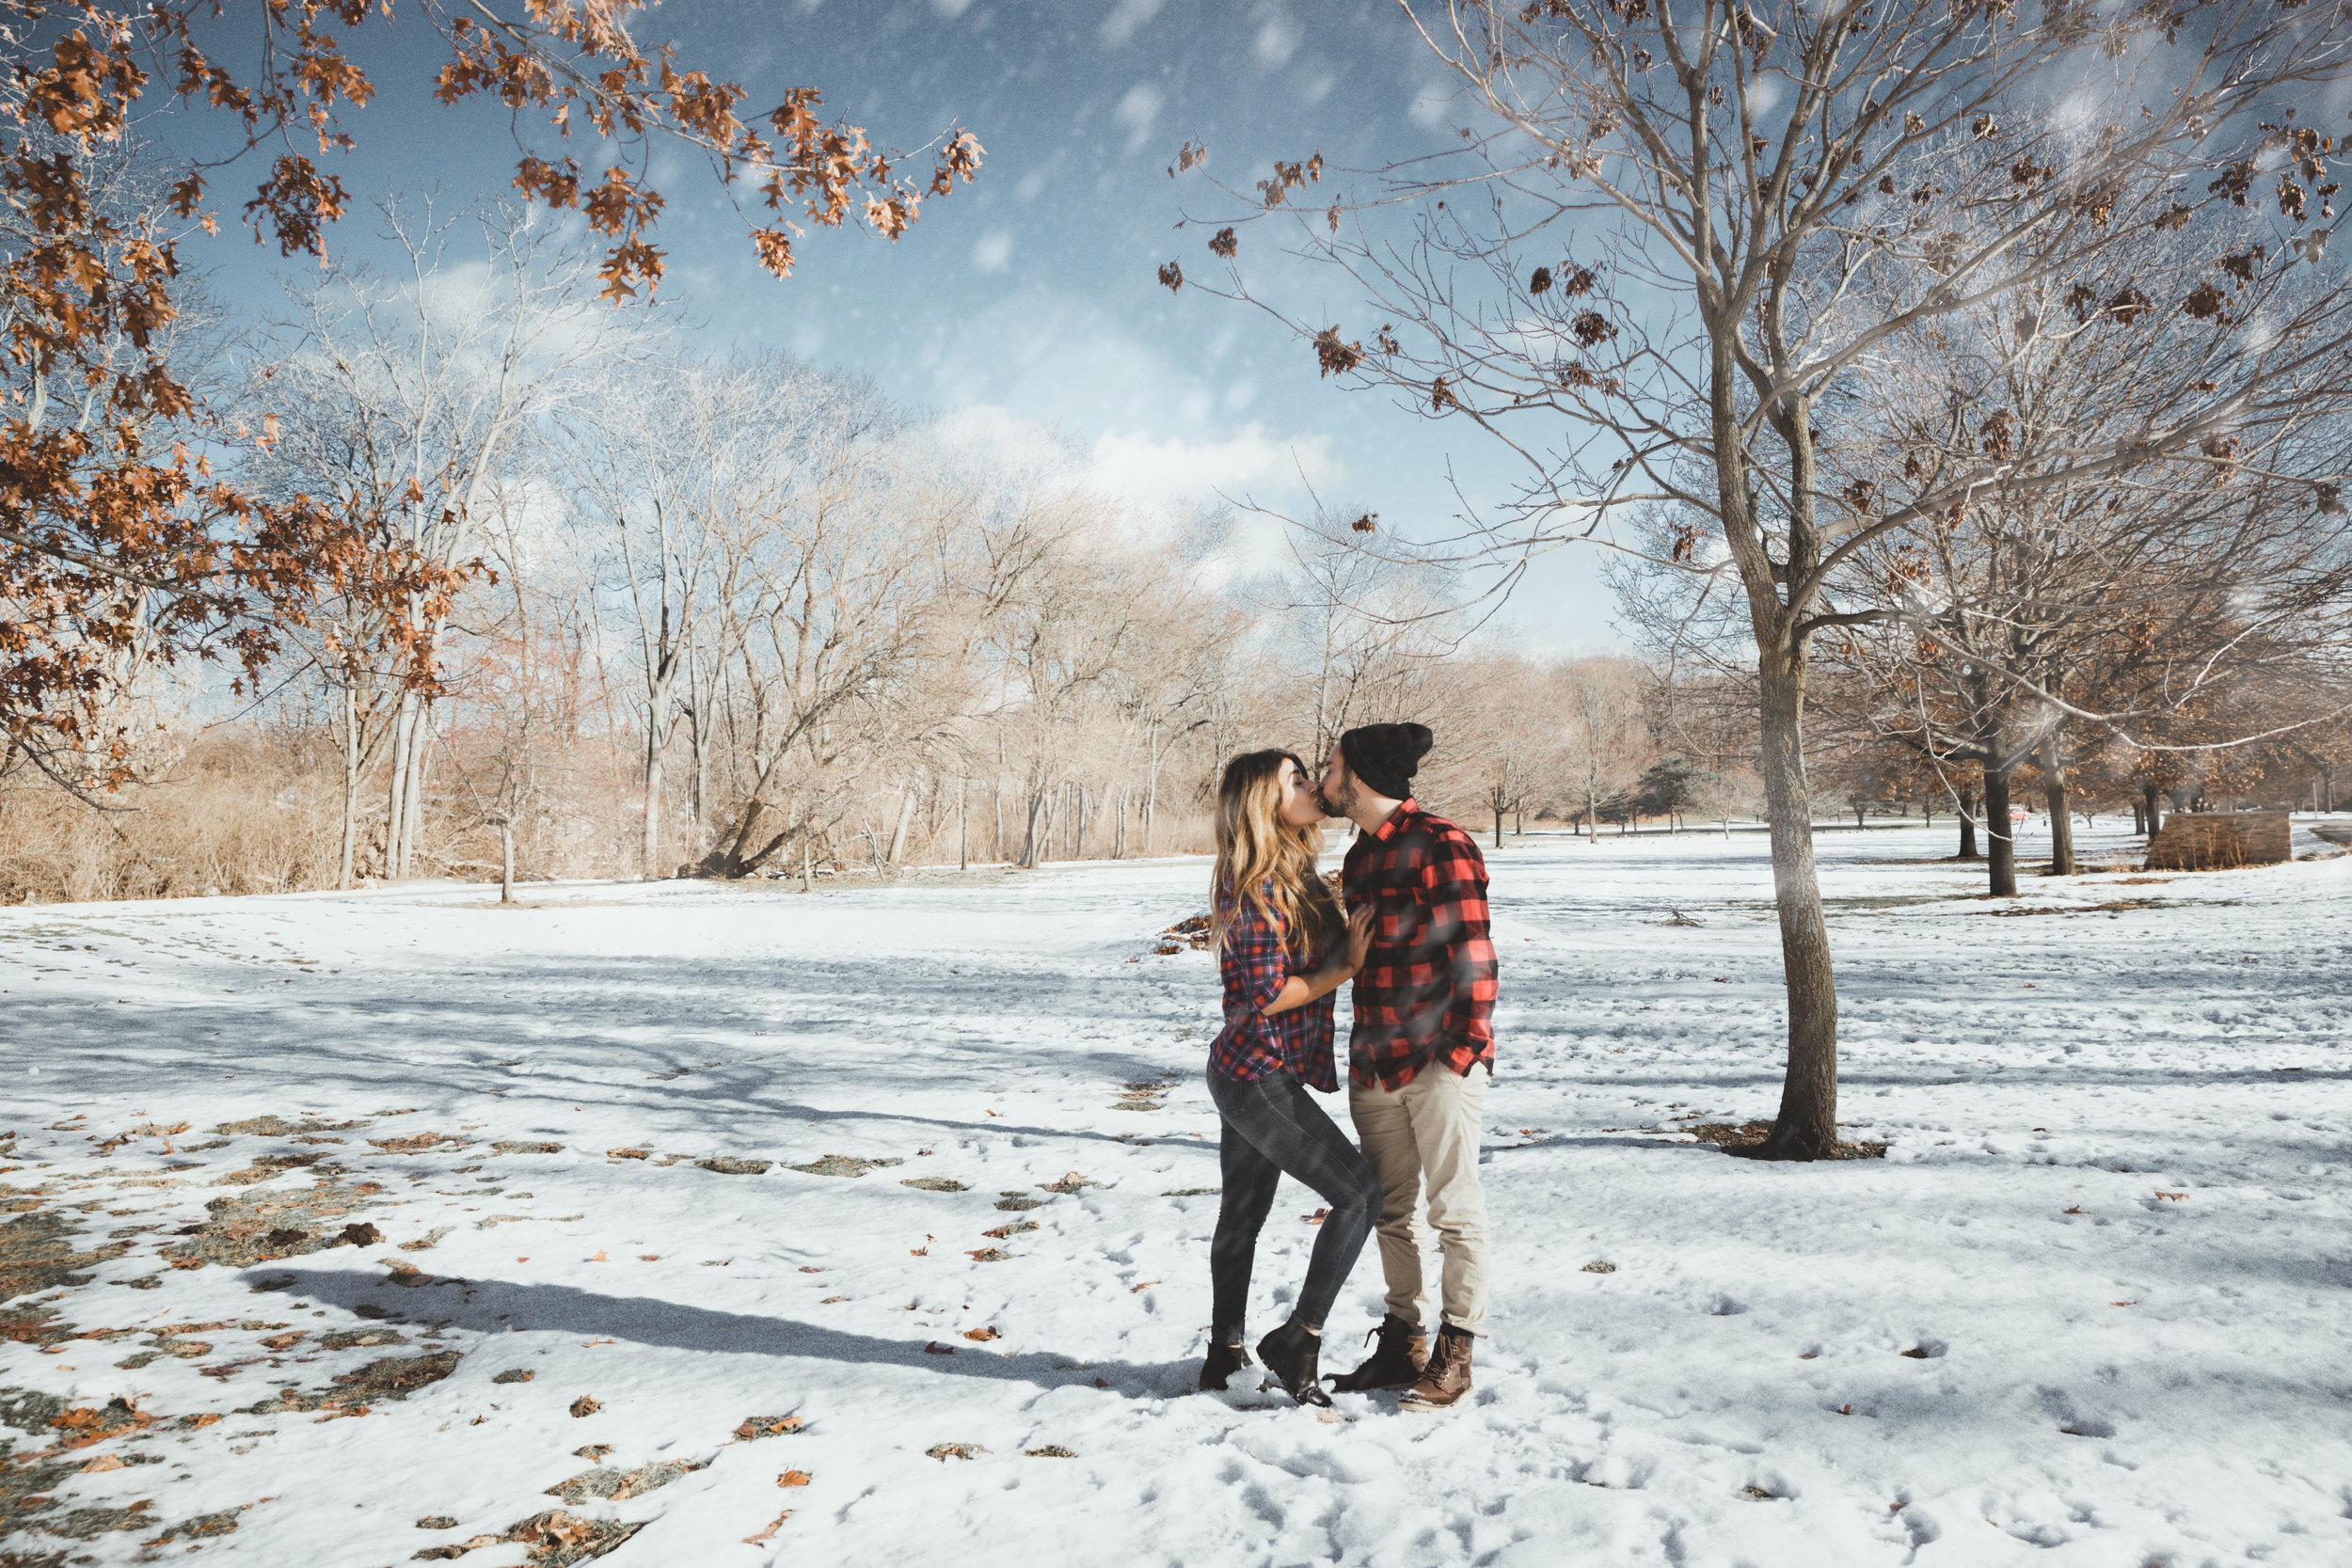 IMG_5081_editedPS_snow.jpg